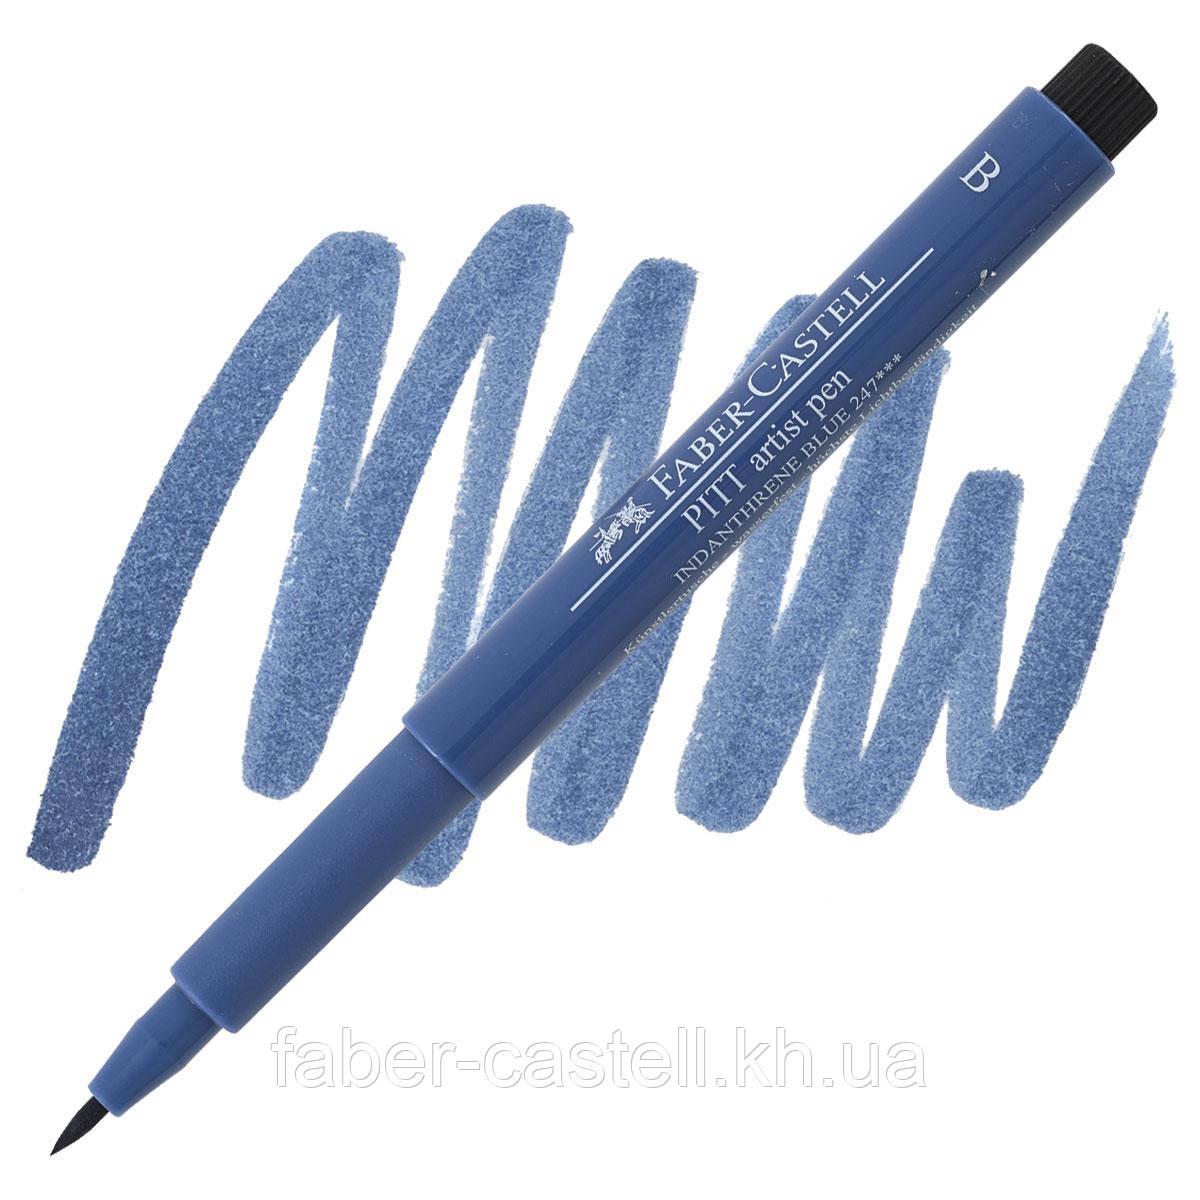 "Ручка-кисточка капиллярная Faber - Castell PITT® ARTIST PEN ""BRUSH"" №247 темно-синий, 167447"